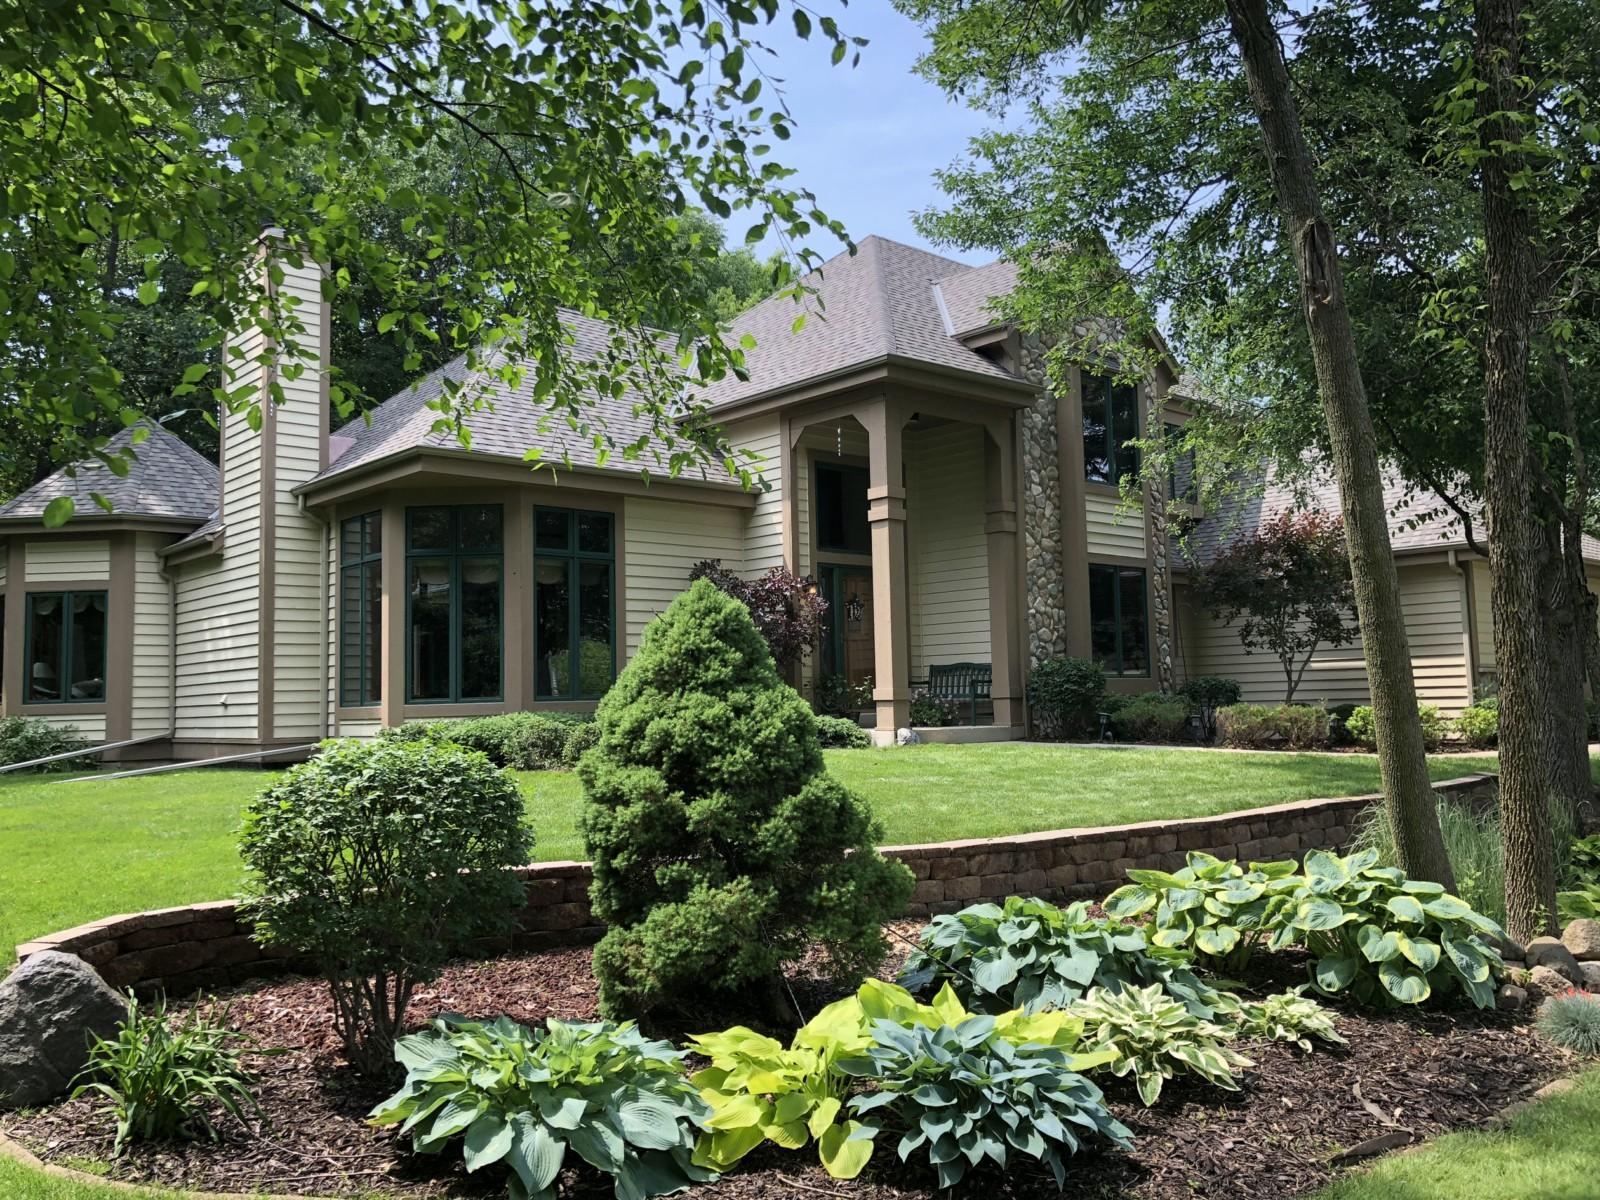 Wisconsin Roofing LLC | Slinger | Residential | New Roof